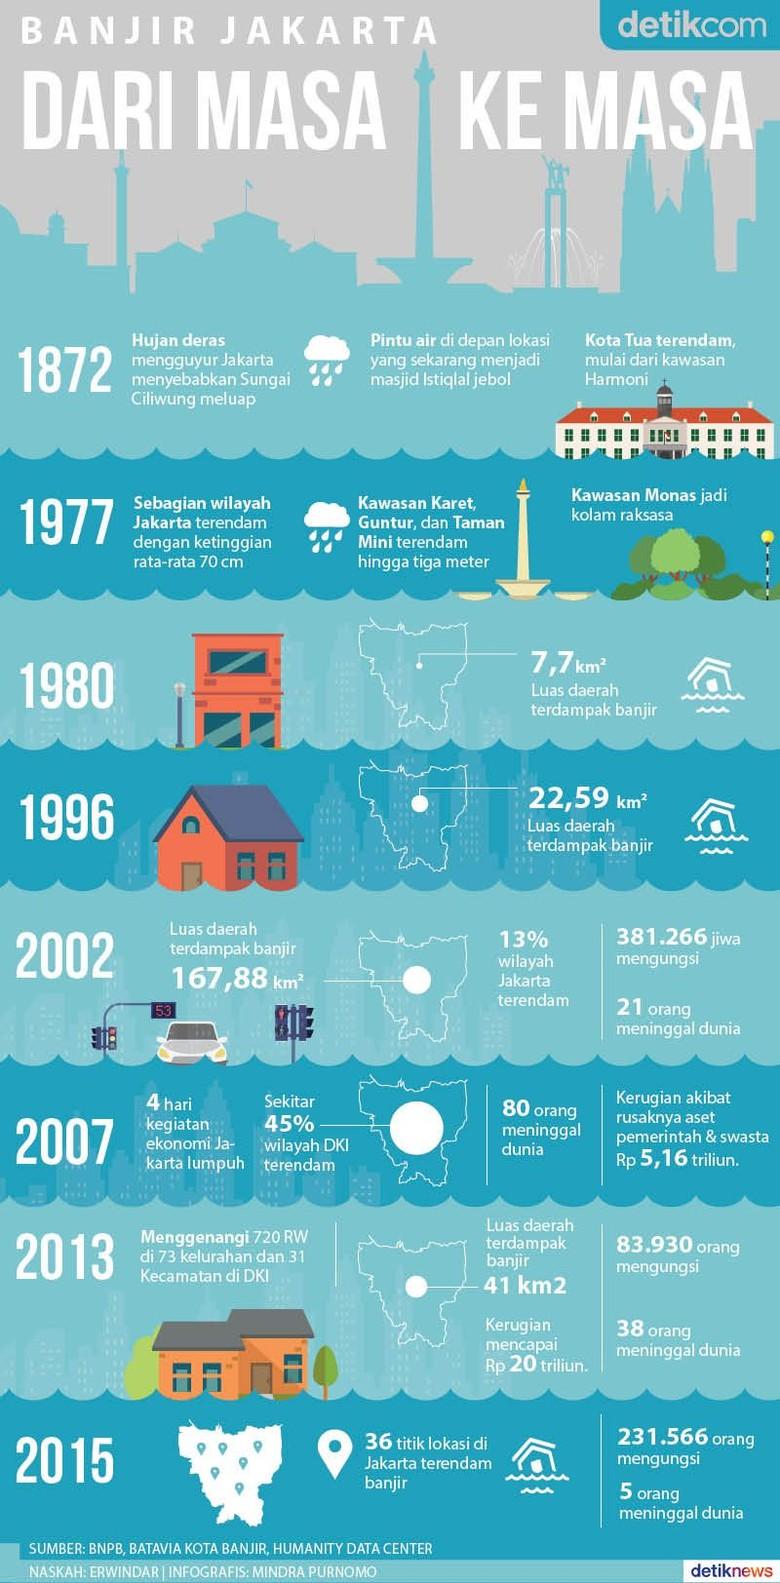 Jakarta dalam Sejarah Banjir